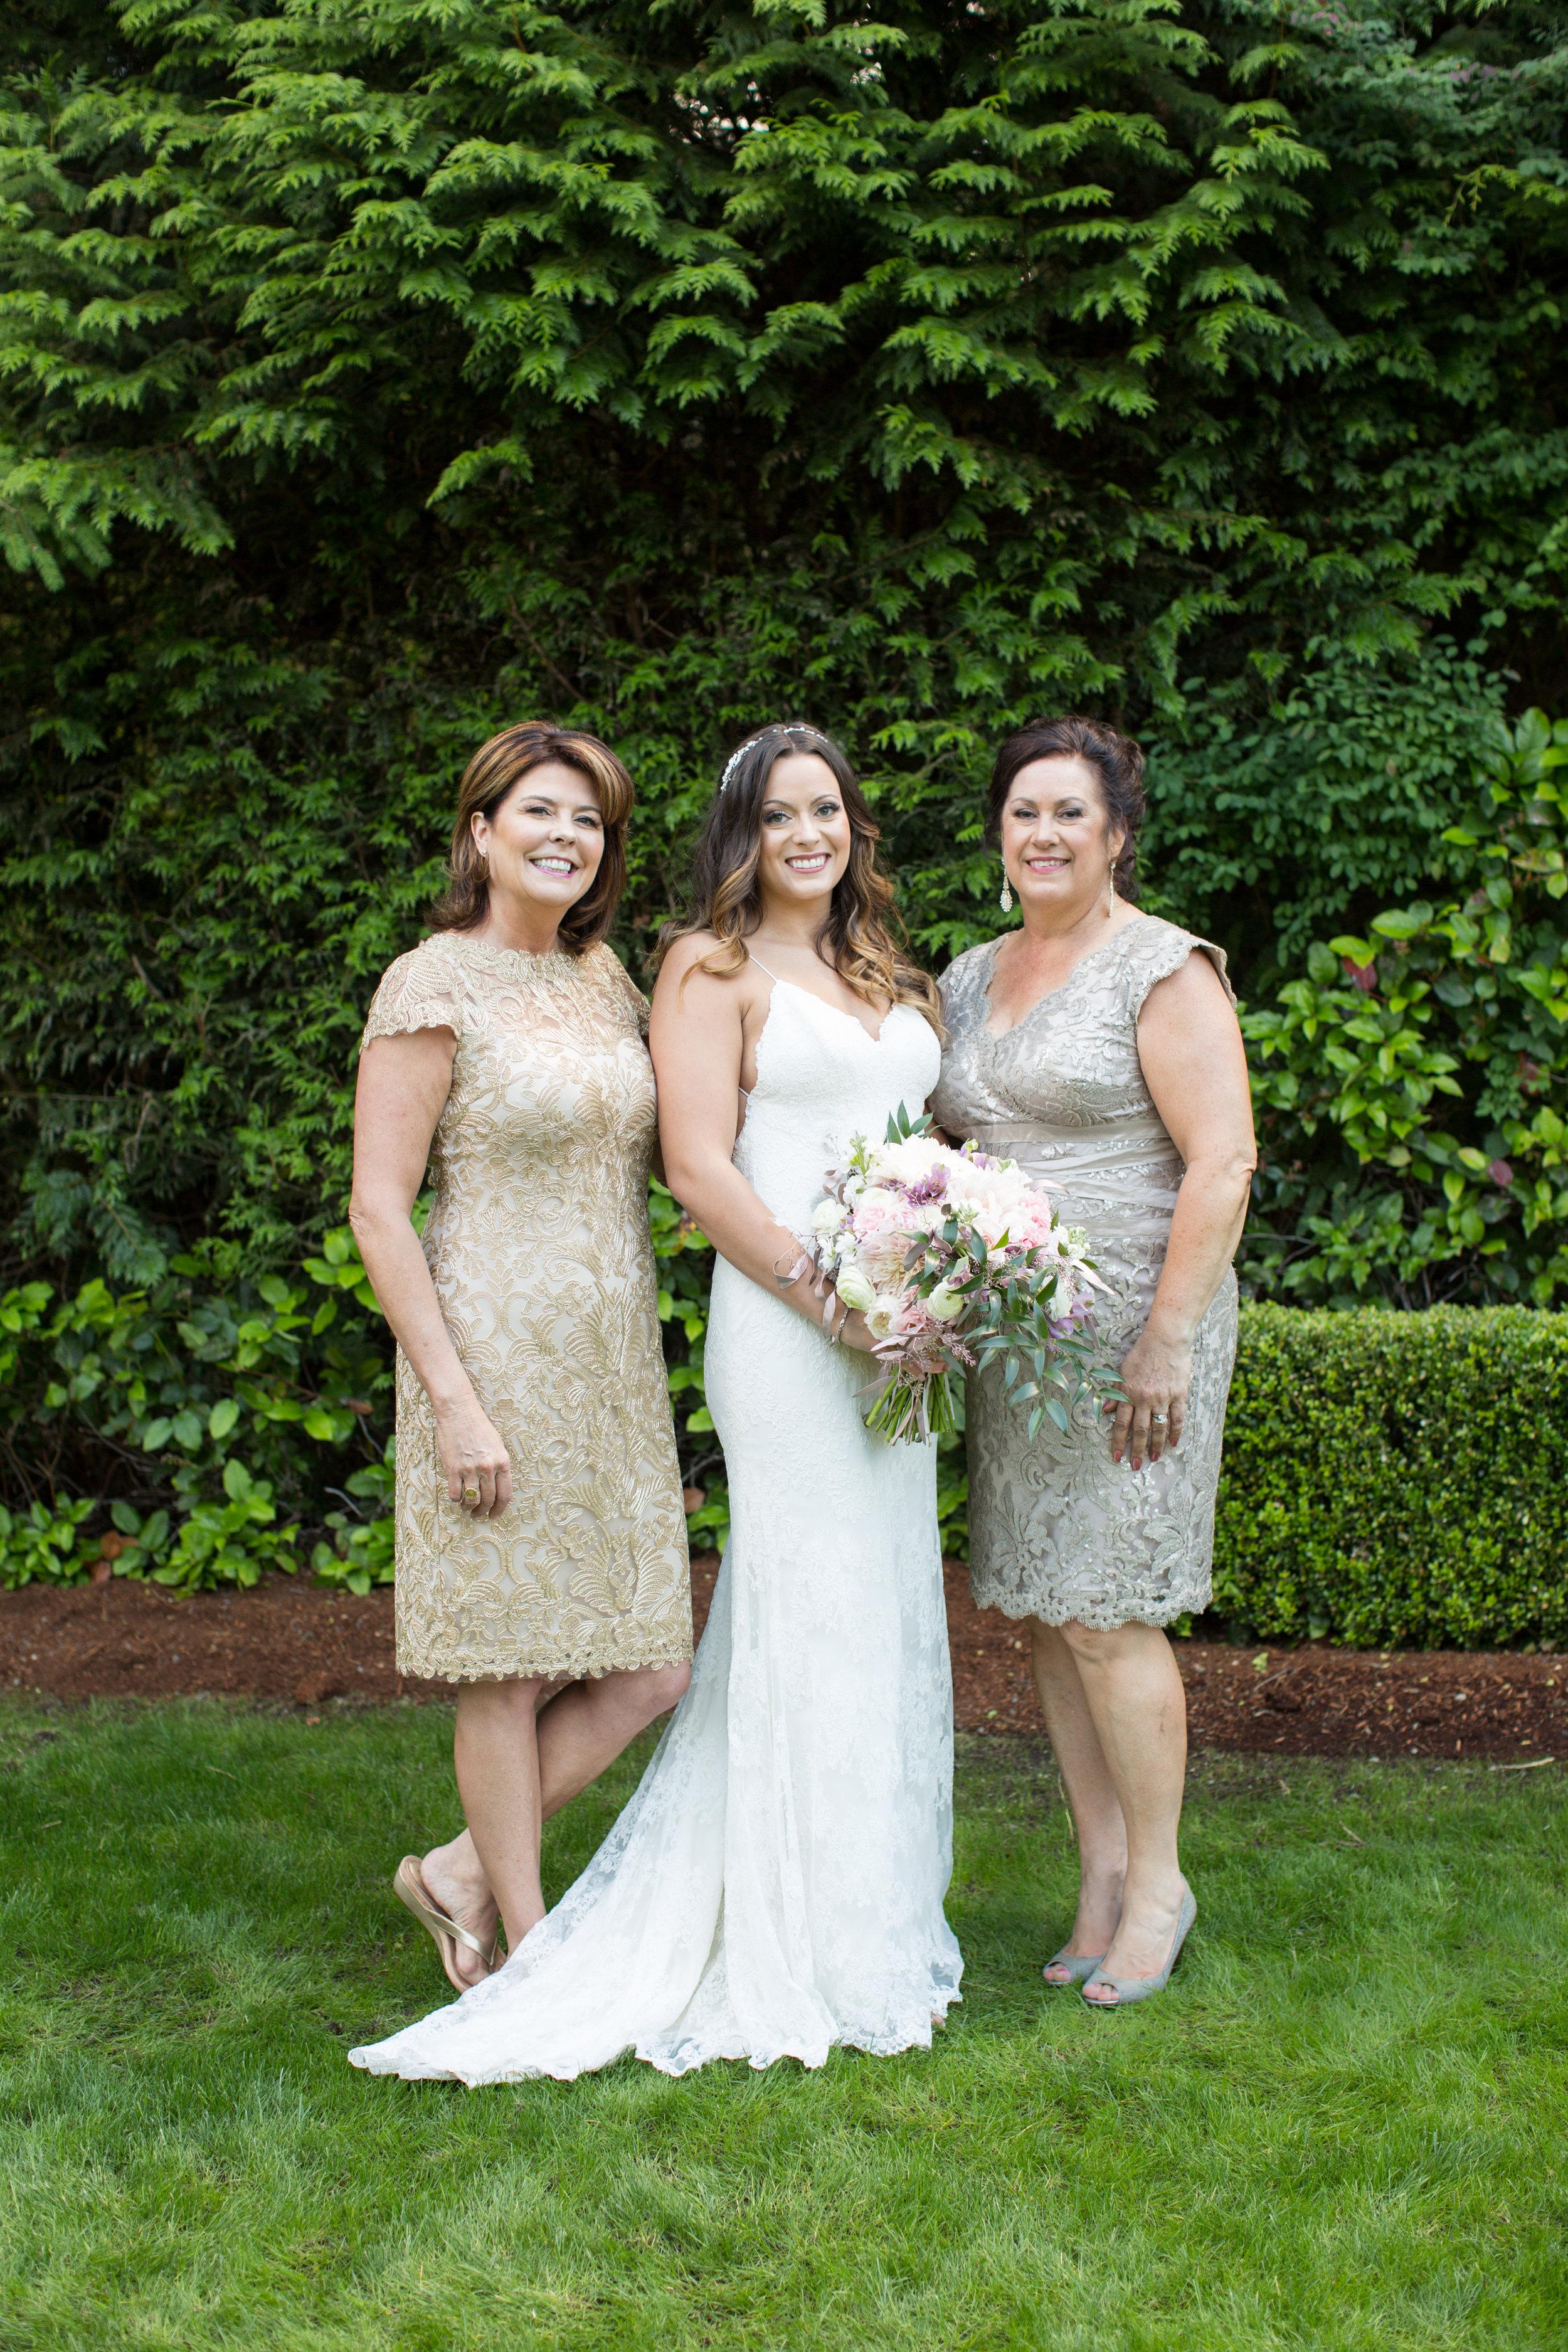 sandstrom_wedding_165.jpg